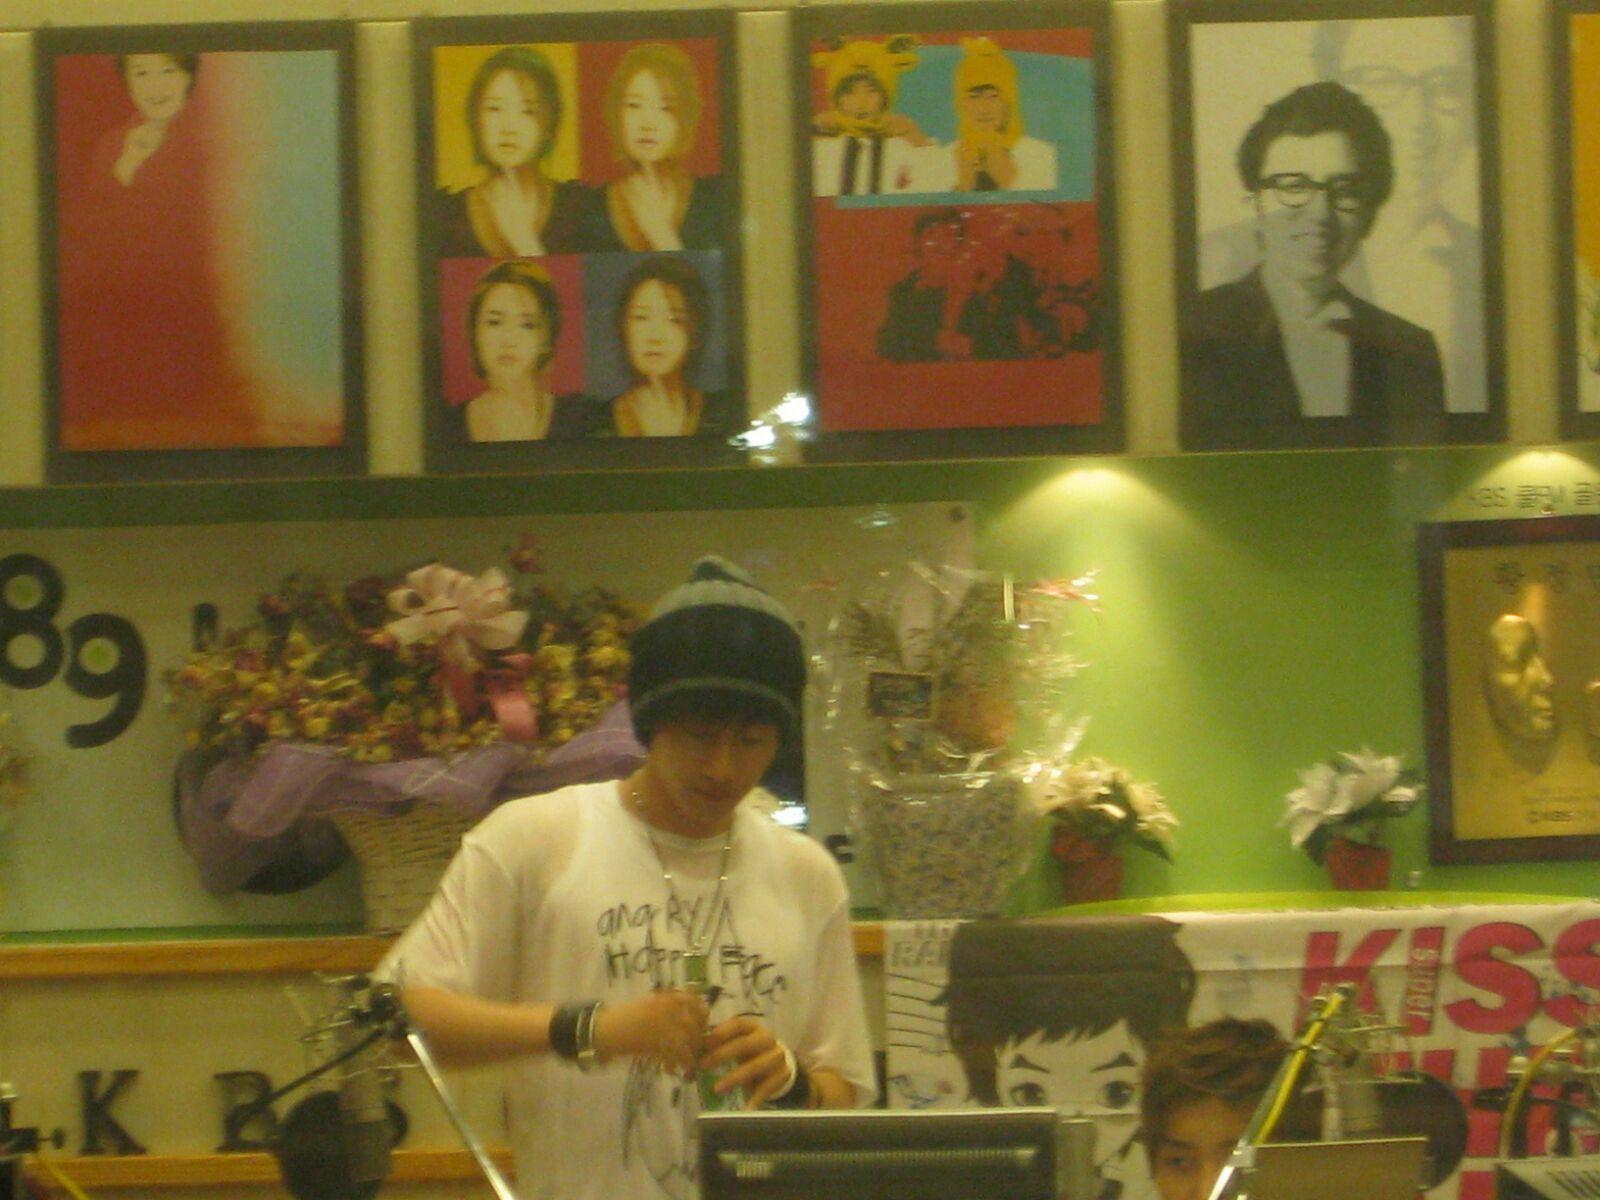 My Voyage - 한국 -  South Korea - Kiss the Radio -  Eunhyuk and Leeteuk